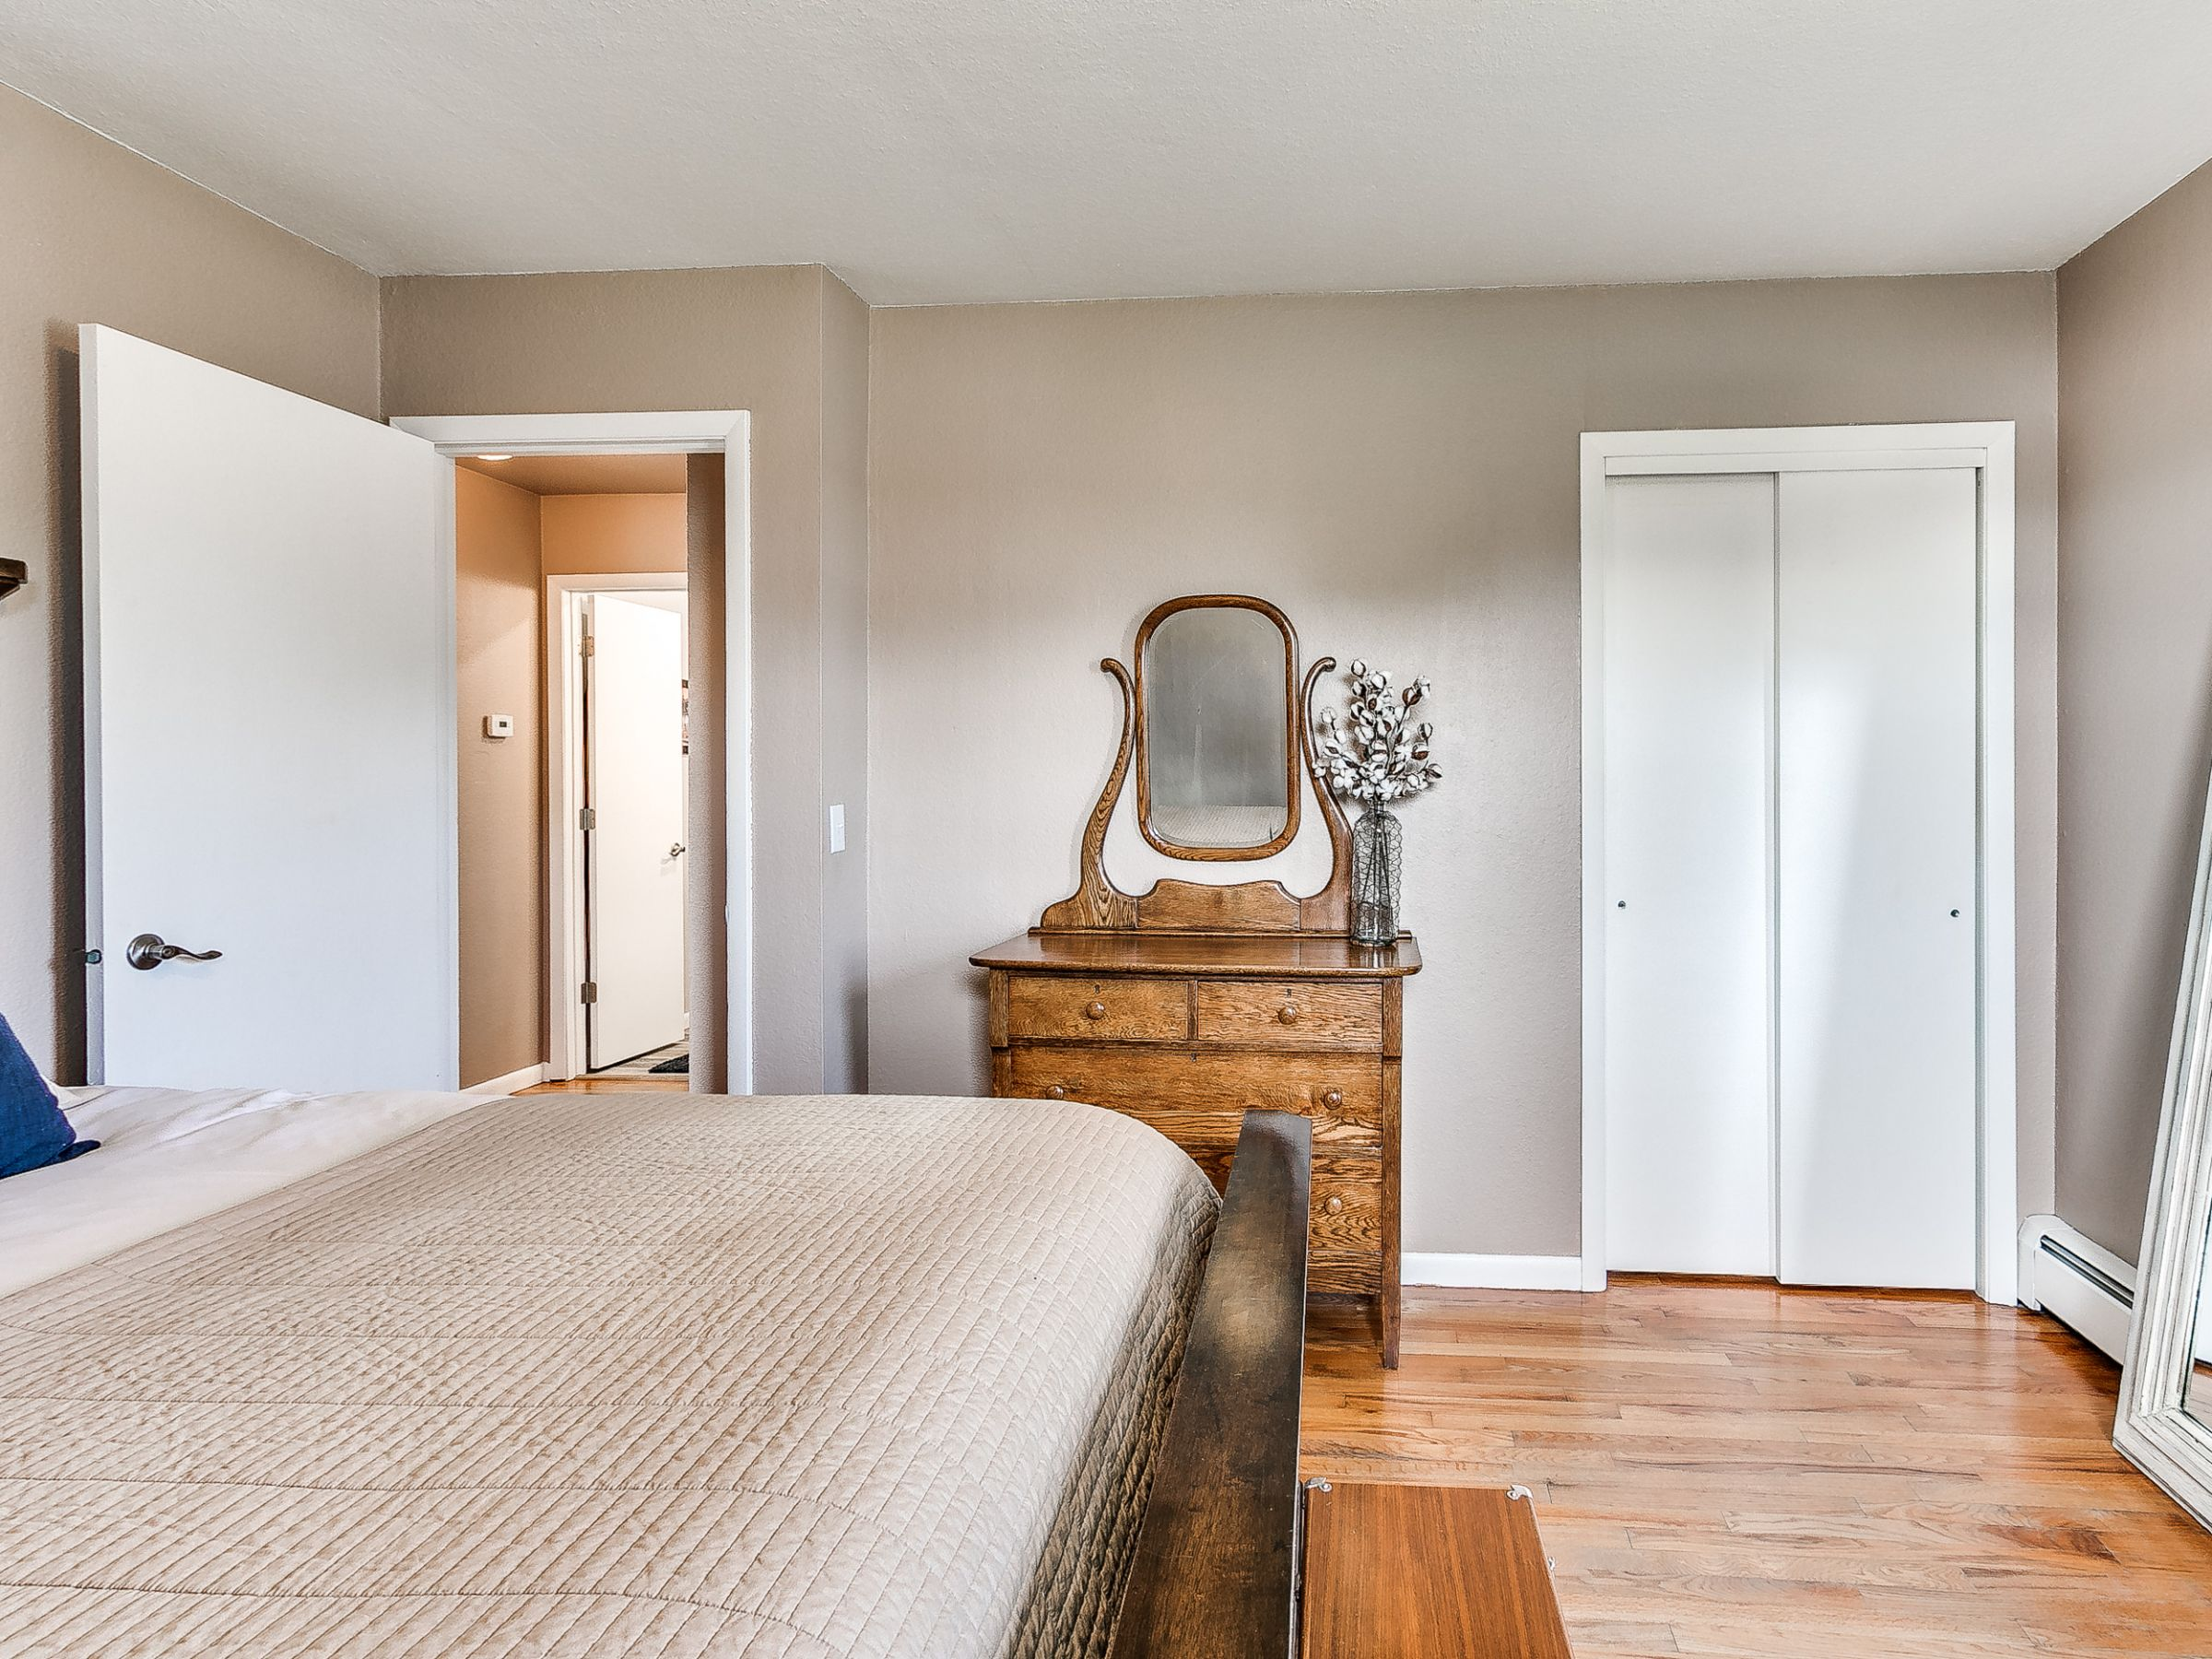 residential-warren-county-iowa-3-acres-listing-number-15516-12-2021-05-12-144937.jpg